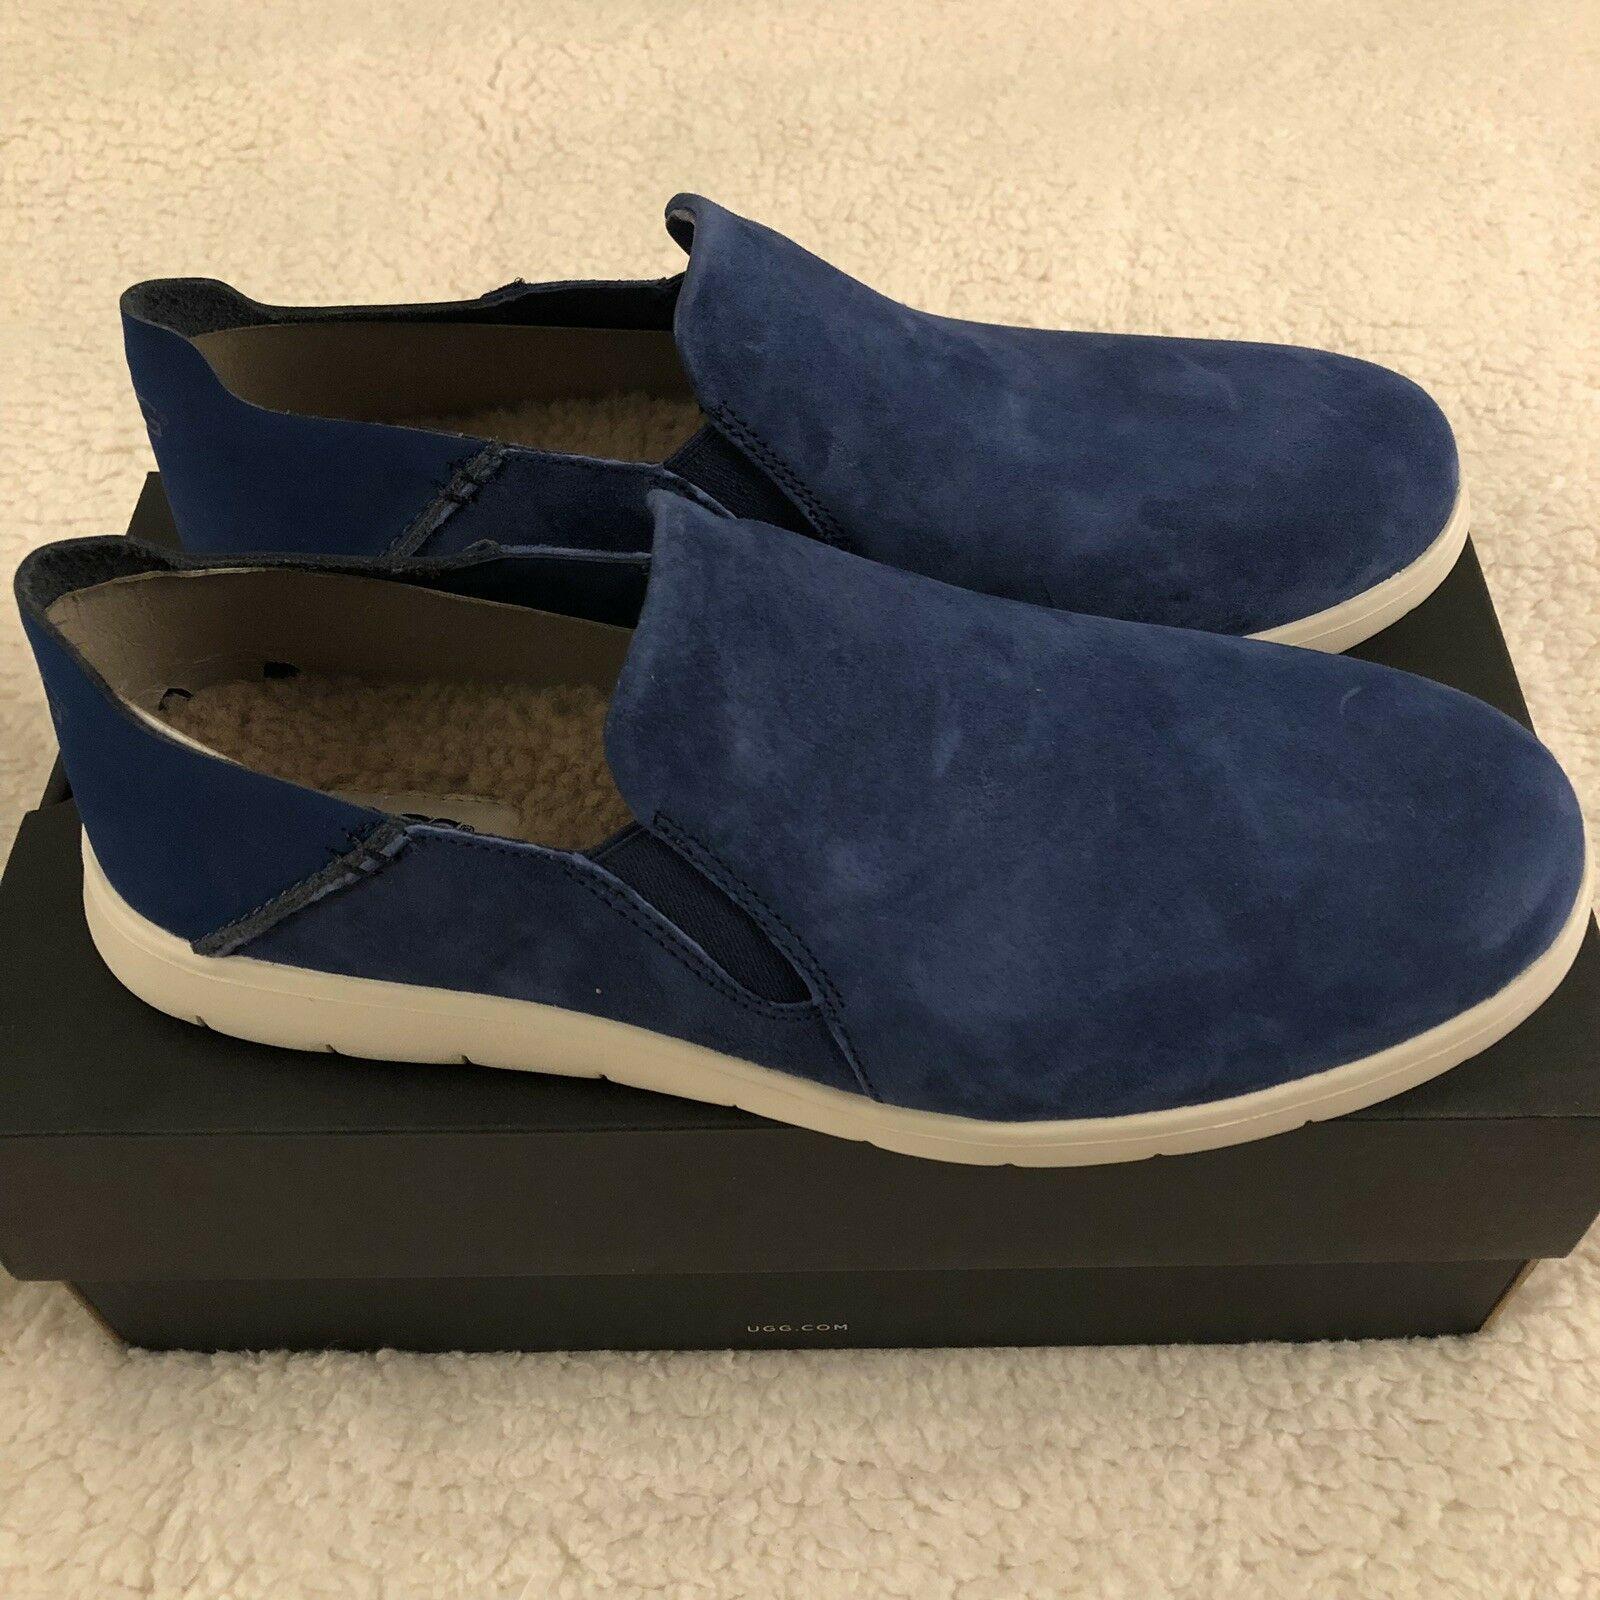 NEW UGG Men's Knox Suede Slip On Sneaker, Sizes 9, 11  Blue, MSRP $100 image 9